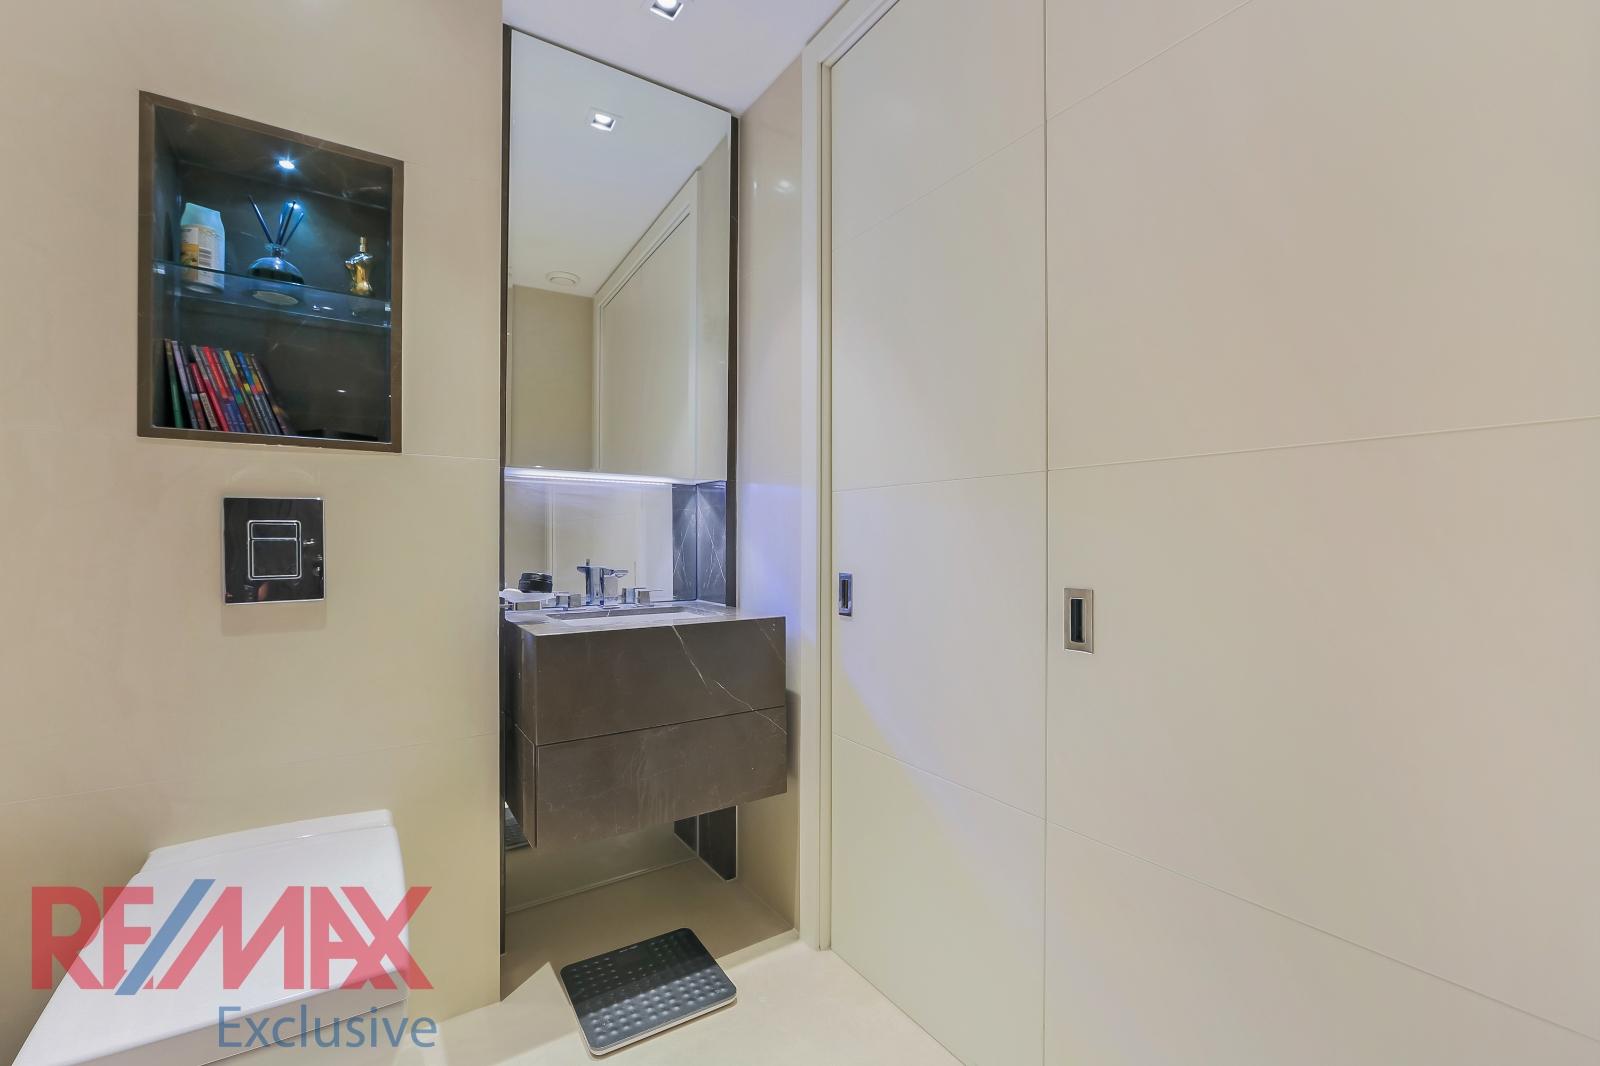 375 Kensington High Street,Bathroom detail